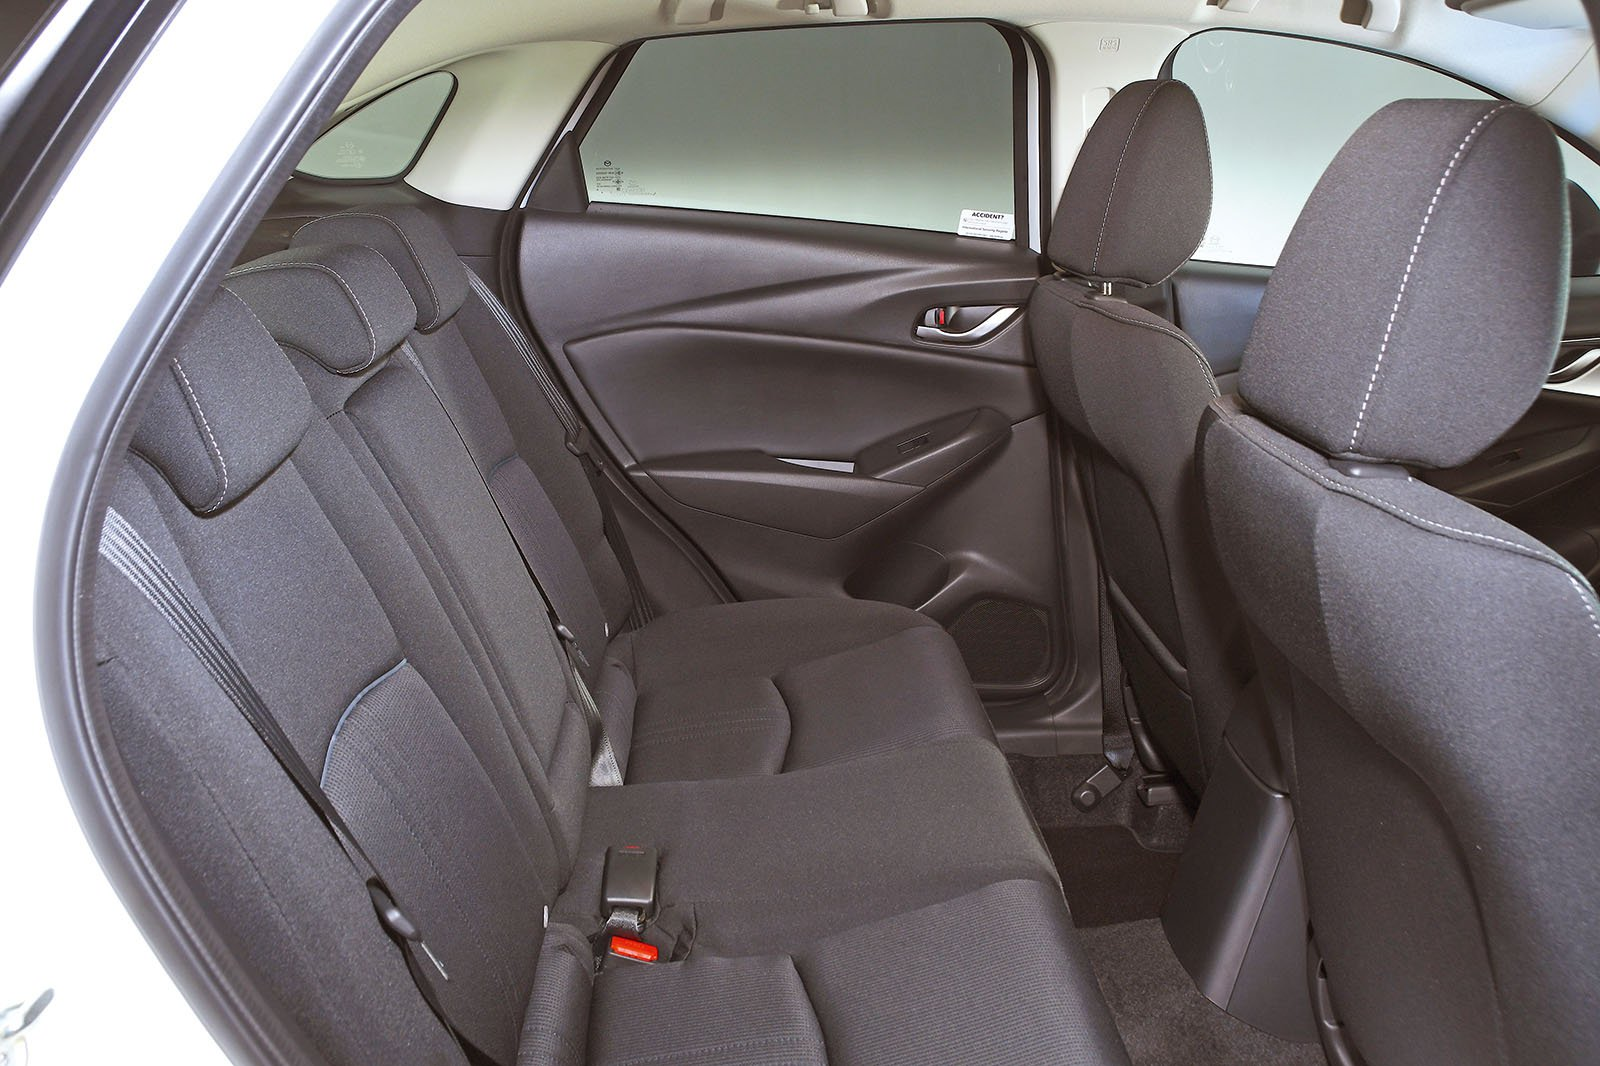 Mazda CX-3 rear seats